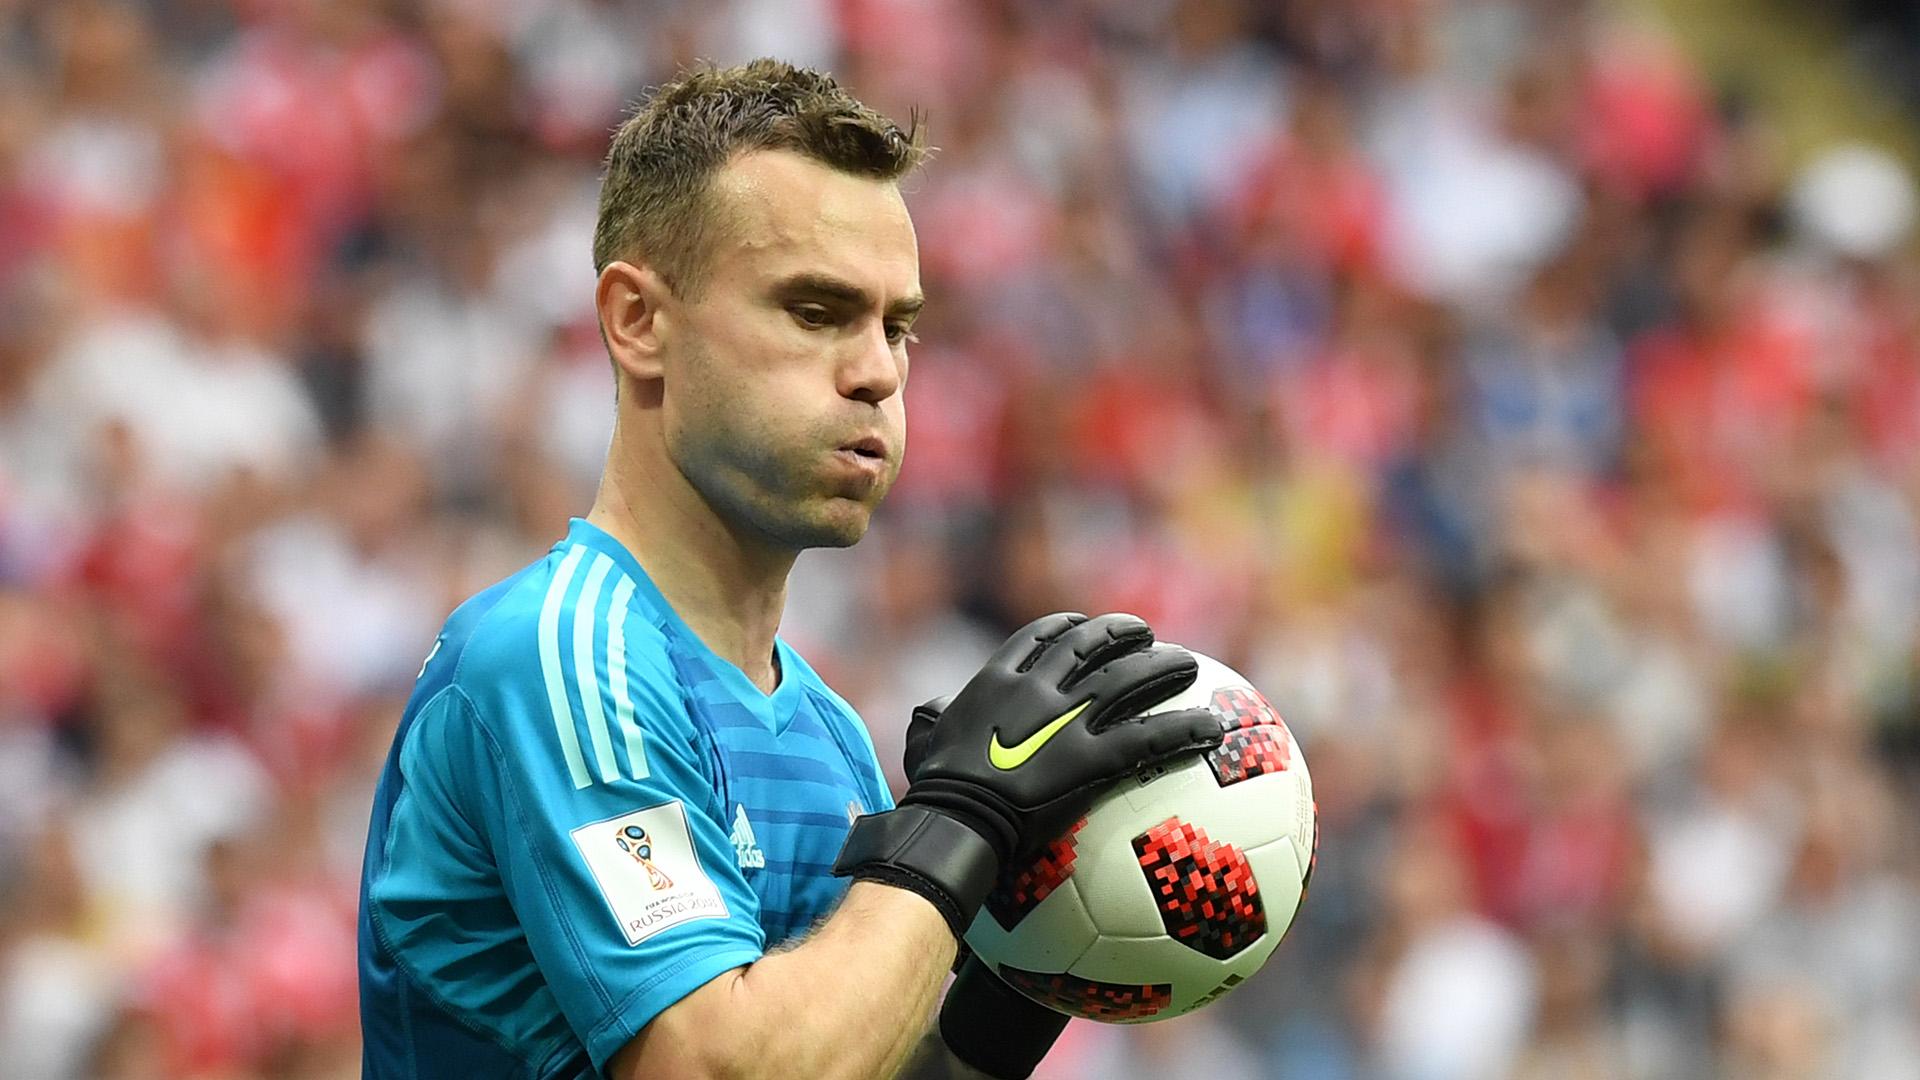 Igor Akinfeev Russia Spain World Cup 2018 010718